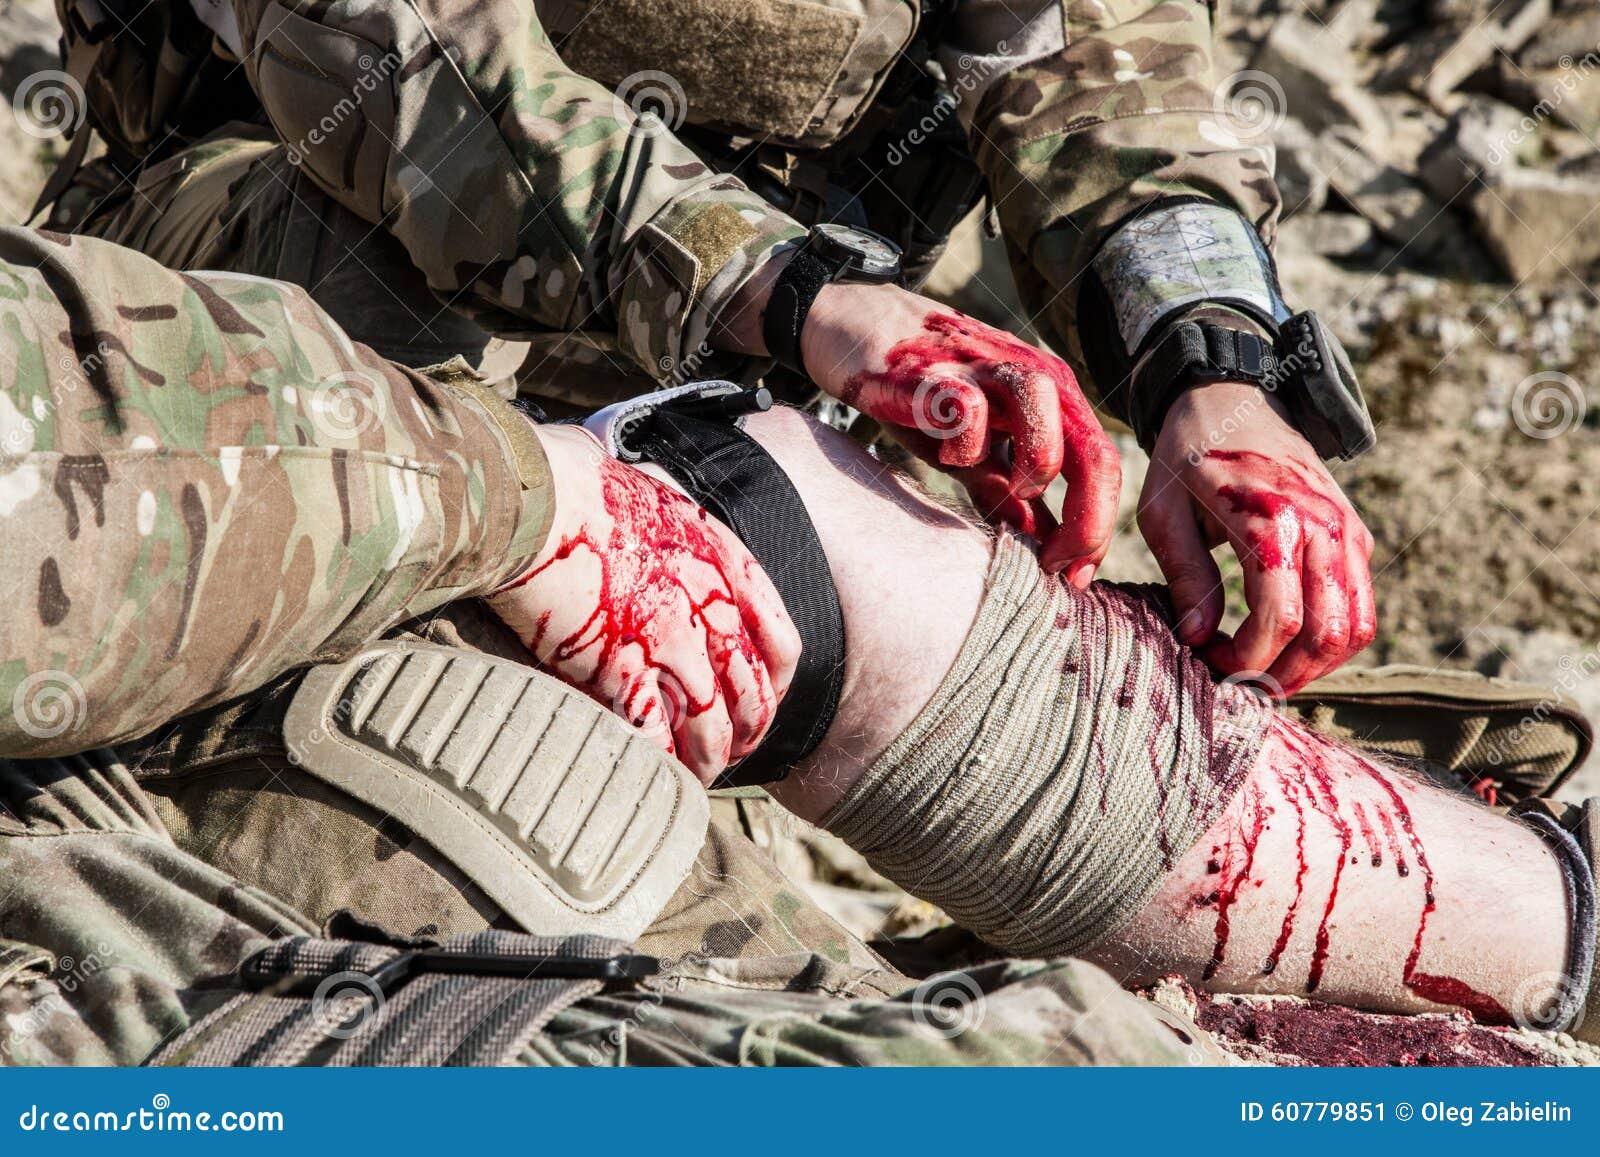 battlefield medicine stock image  image of blood